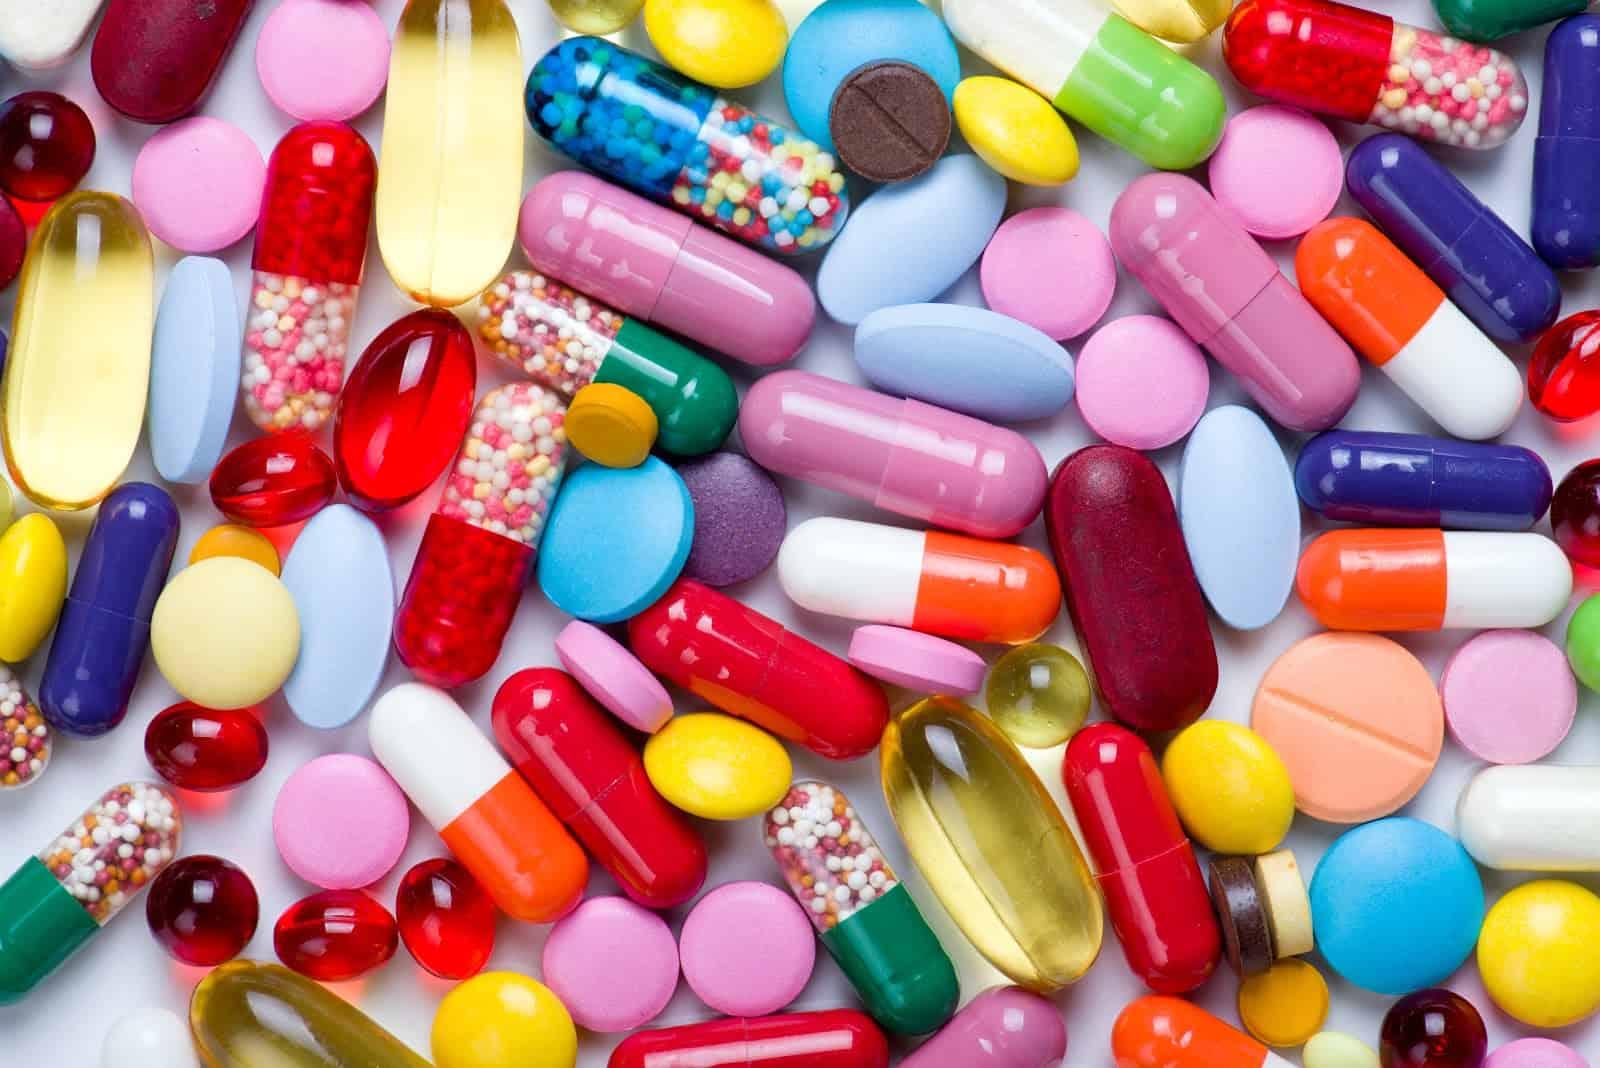 colorful medication pills